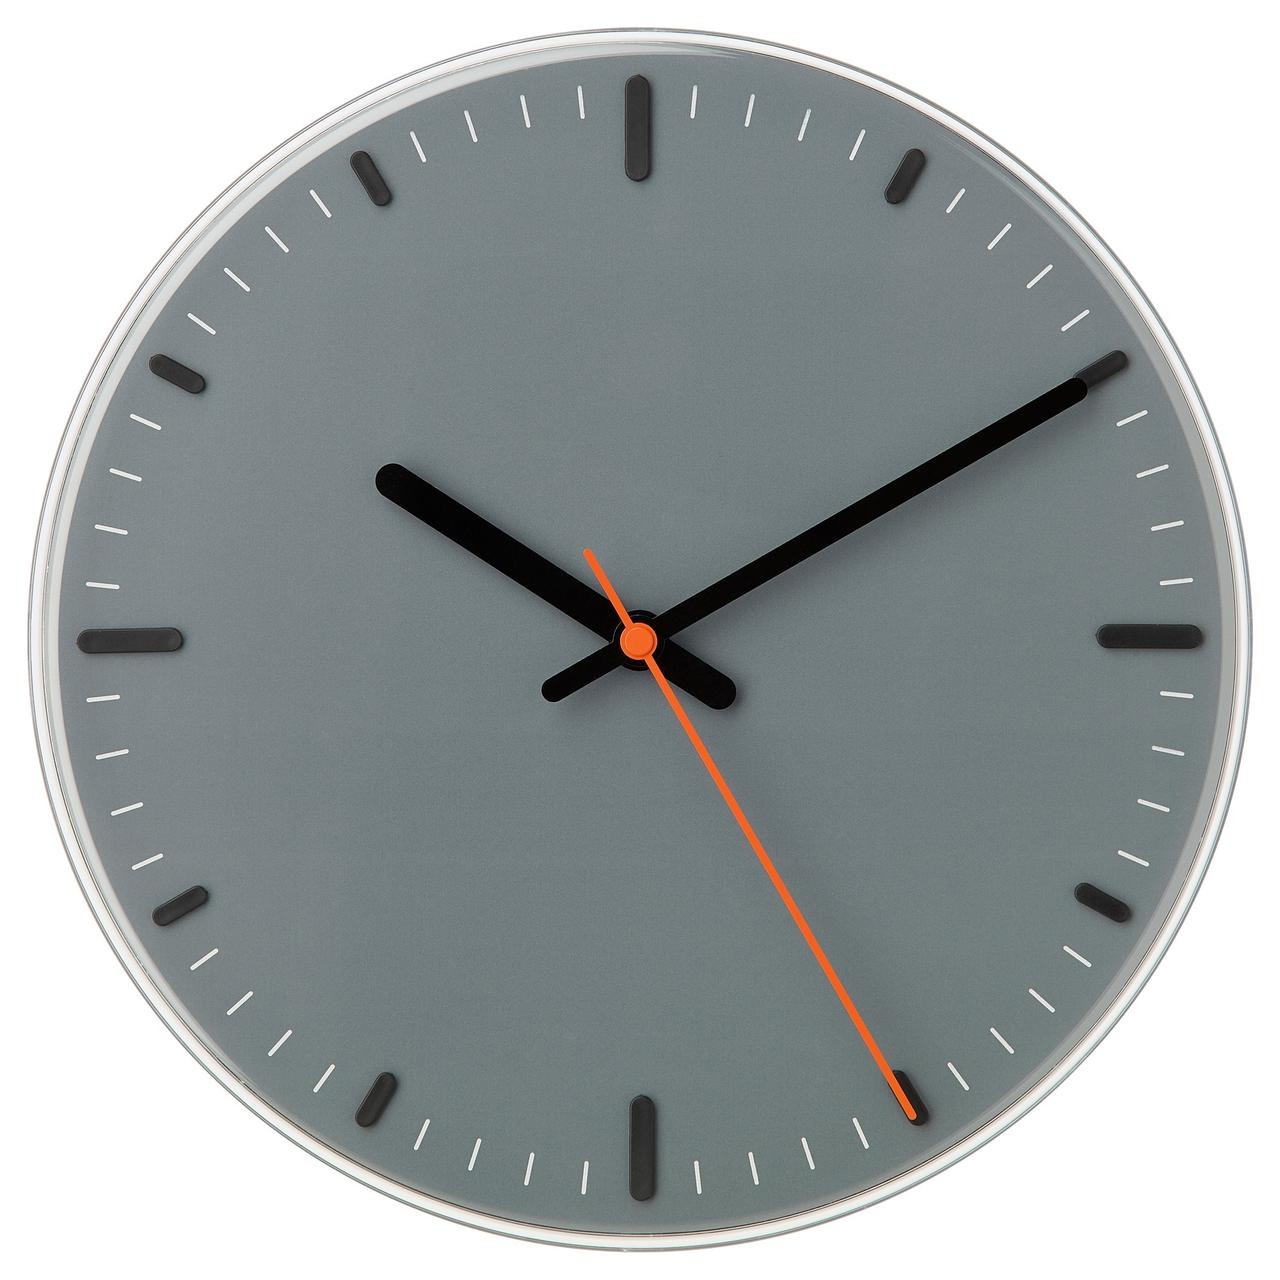 часы настенные Ikea Svajpa 30 см серый 40392058 цена 642 грн